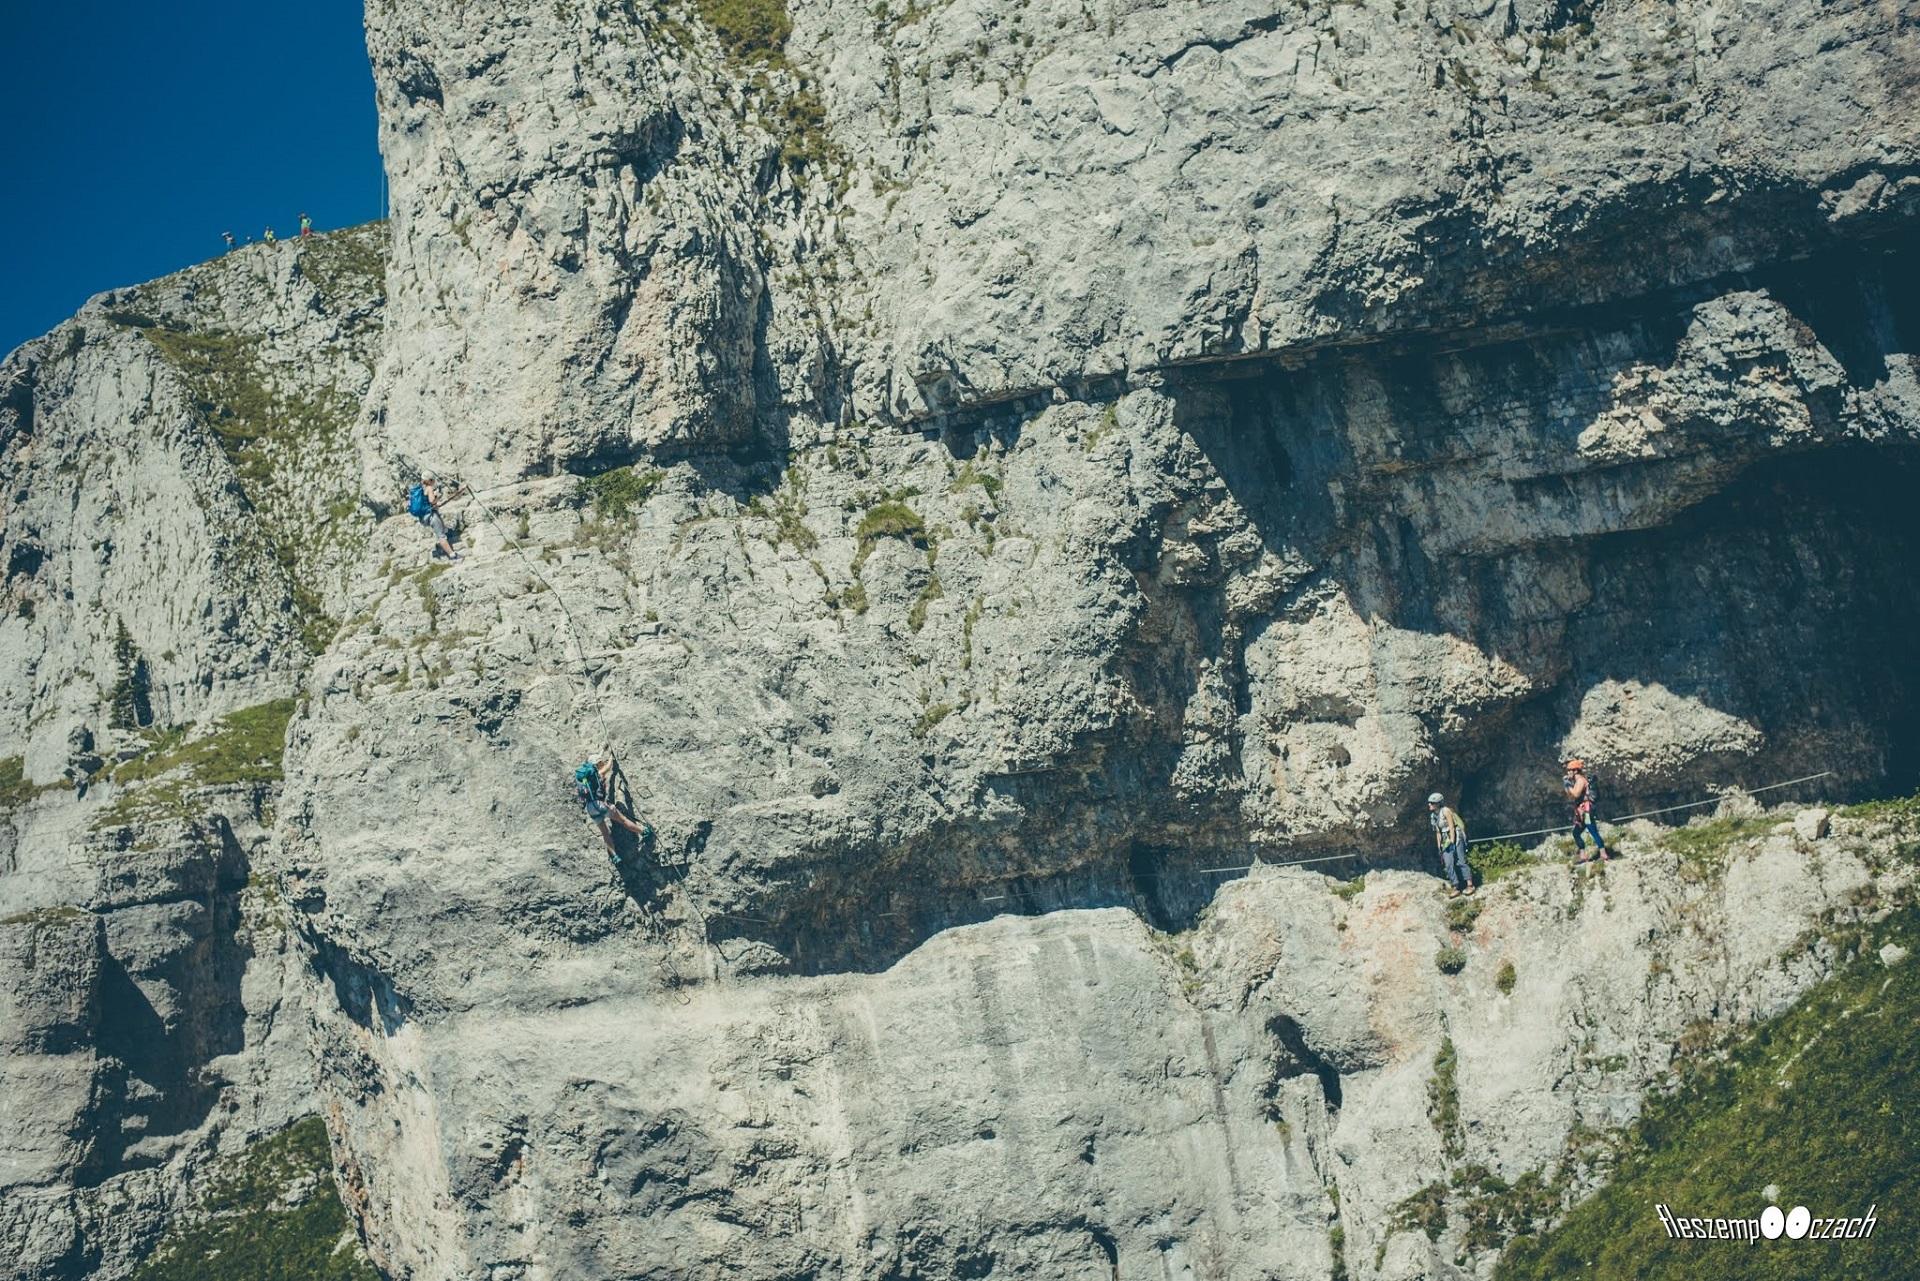 Kluczowy moment na ferracie Panorama Klettersteig Sisi